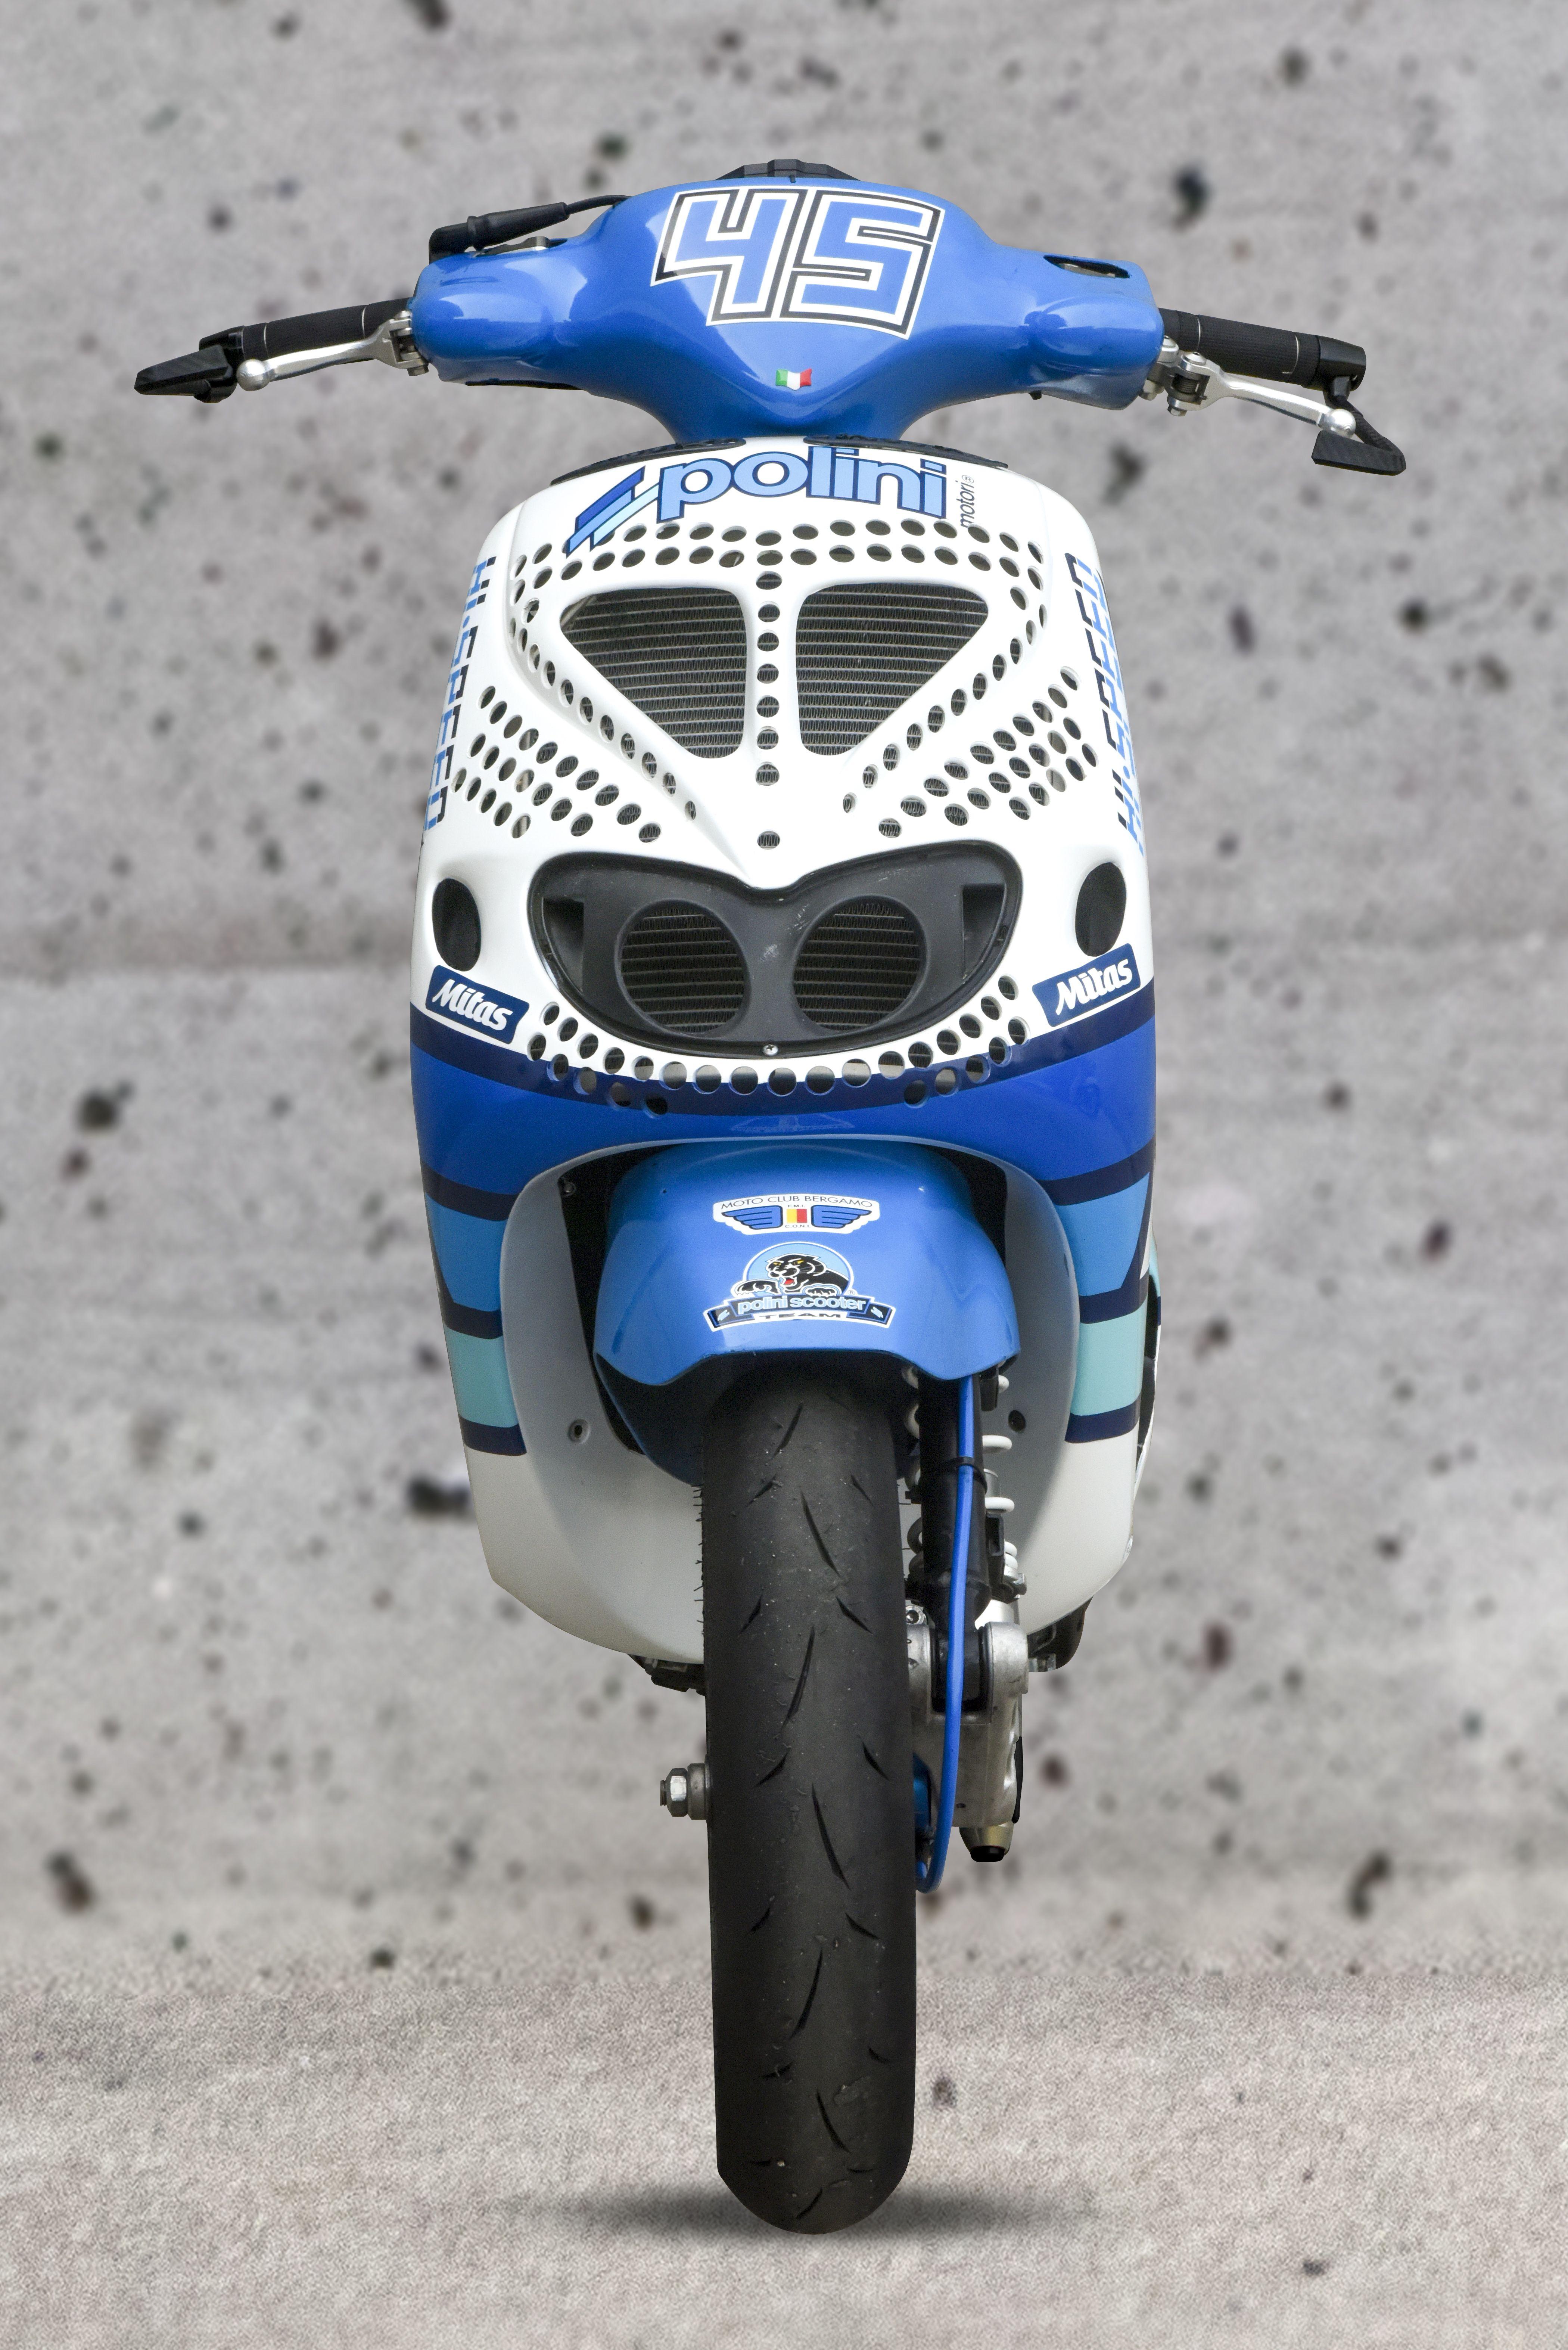 piaggio zip sp | my favorite cars & motorcycles | pinterest